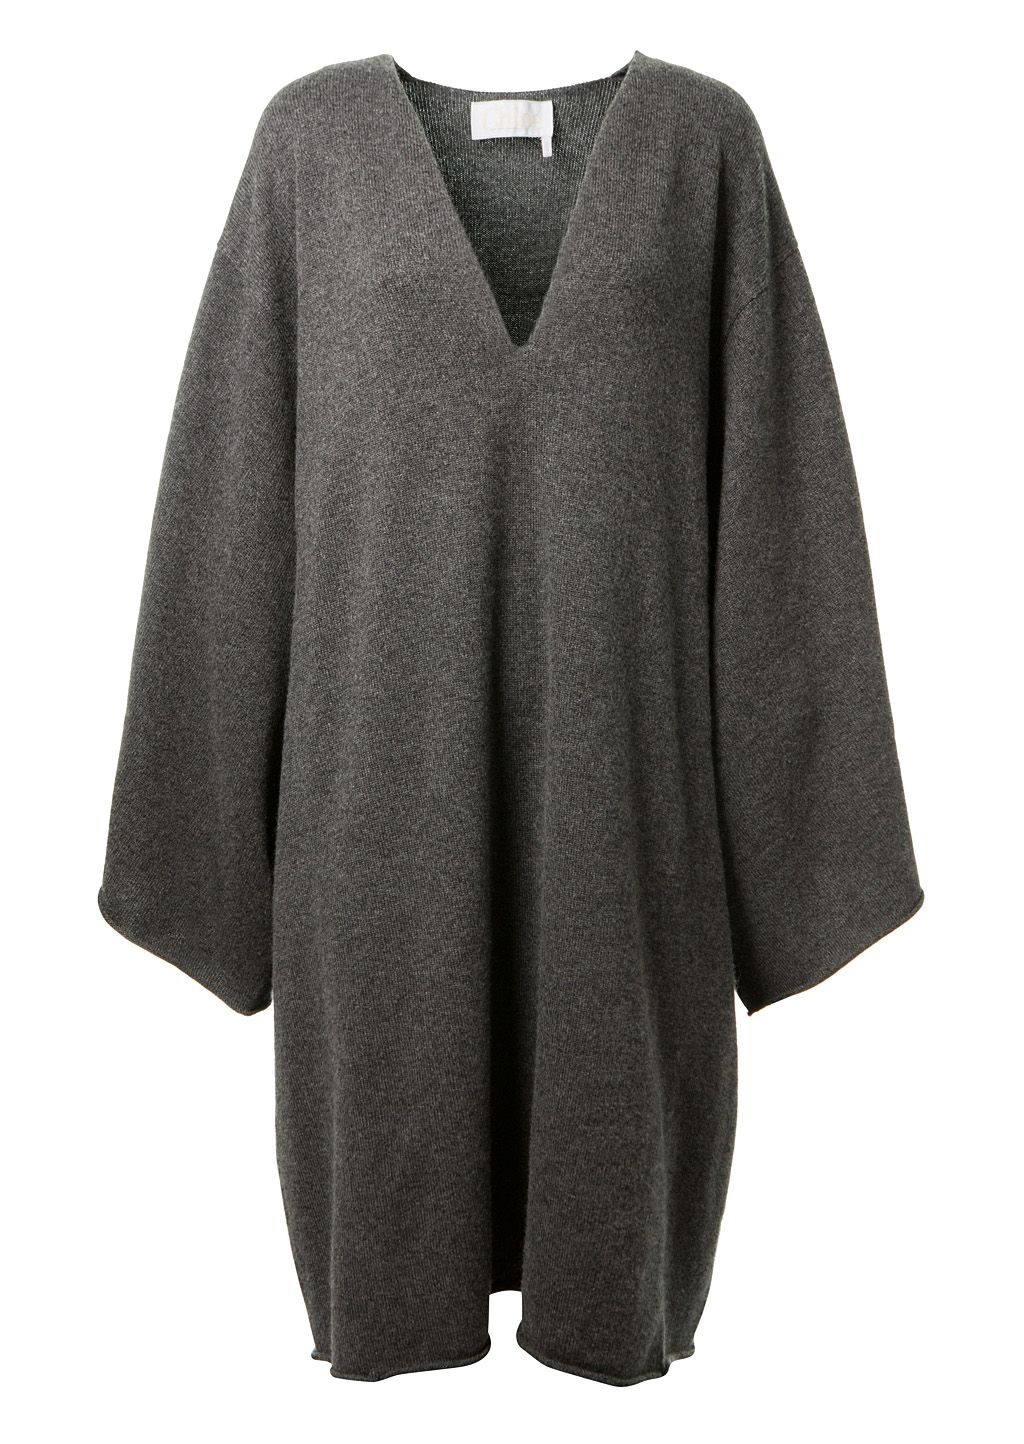 376e30a7b8d CHLOÉ Chloé Grey Cashmere Sweater Dress.  chloé  cloth